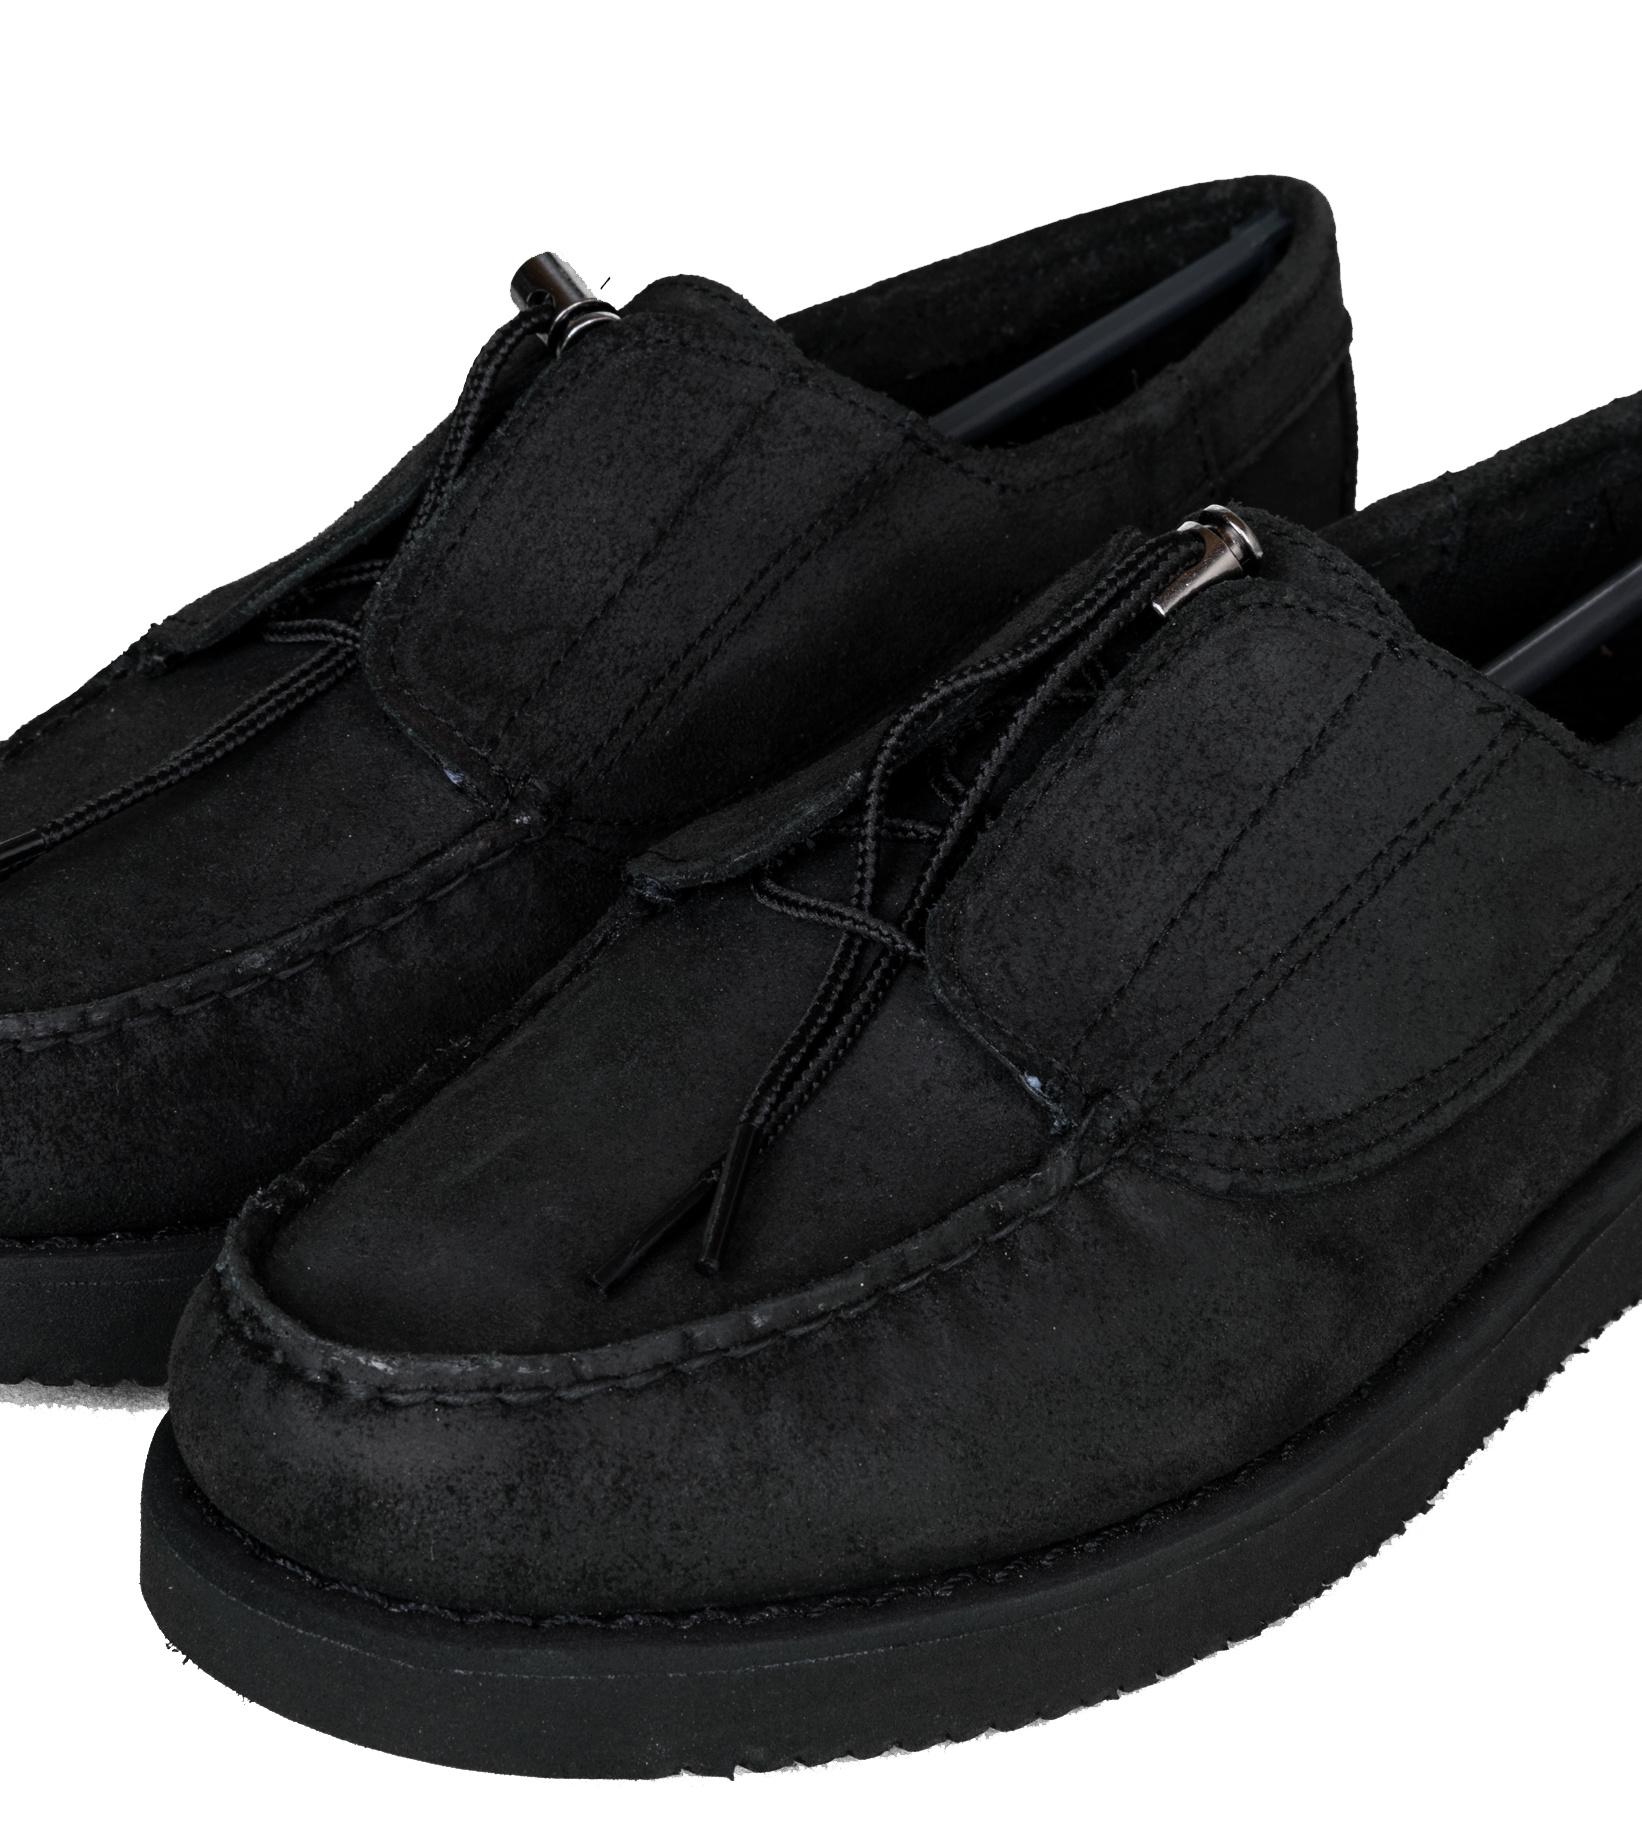 "Coverdeck x Engineered Garments ""Black ""-7"